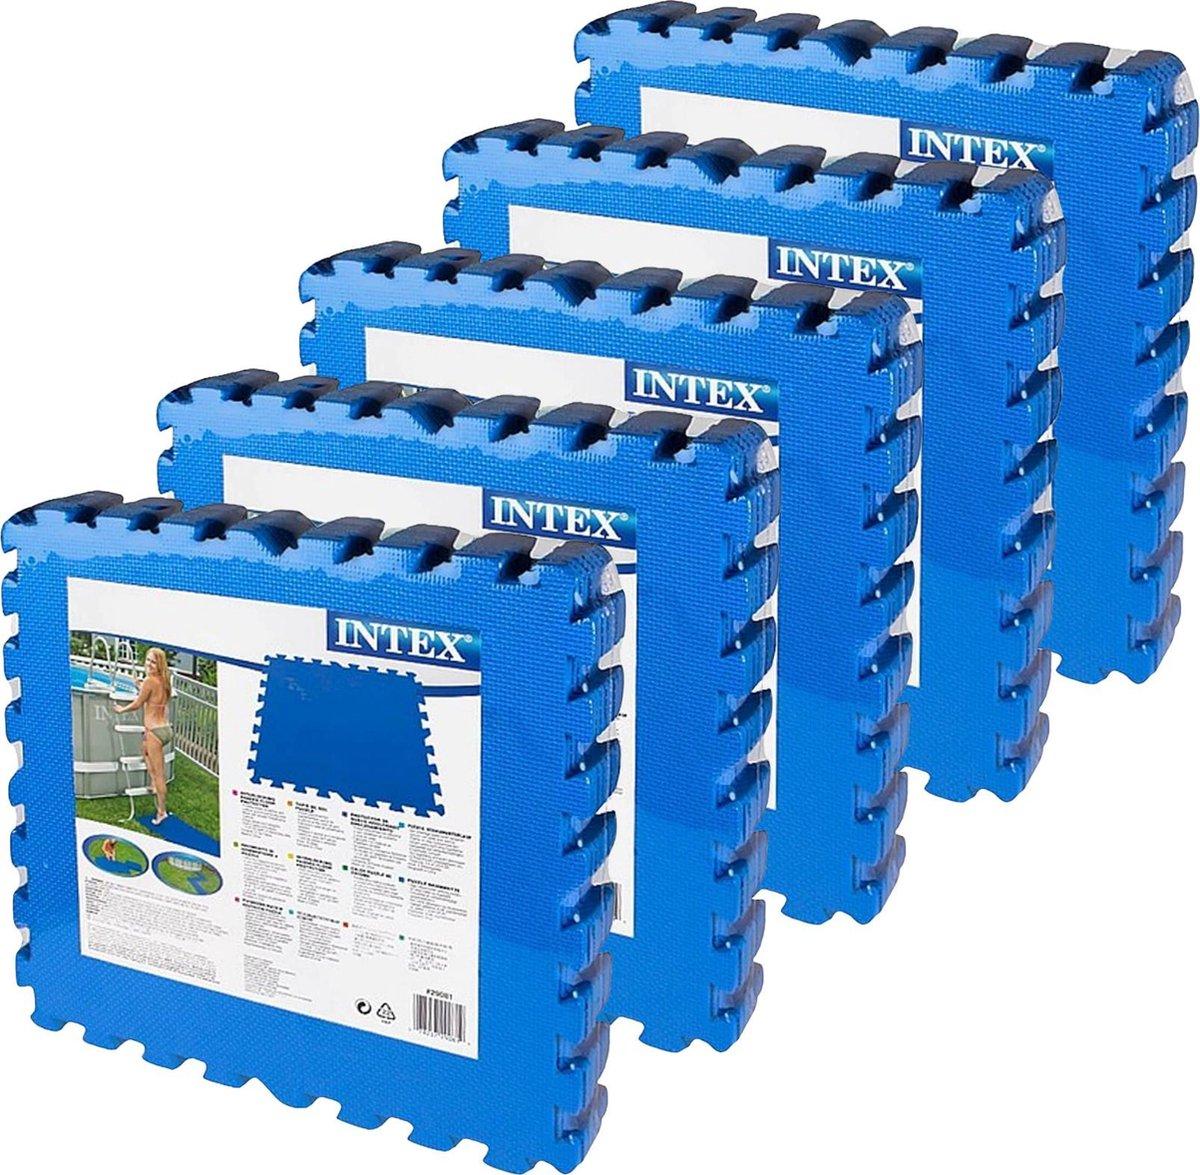 Intex - zwembad tegels - blauw - 50 x 50 cm - 40 tegels - 10 m2 - zwembad ondertegels